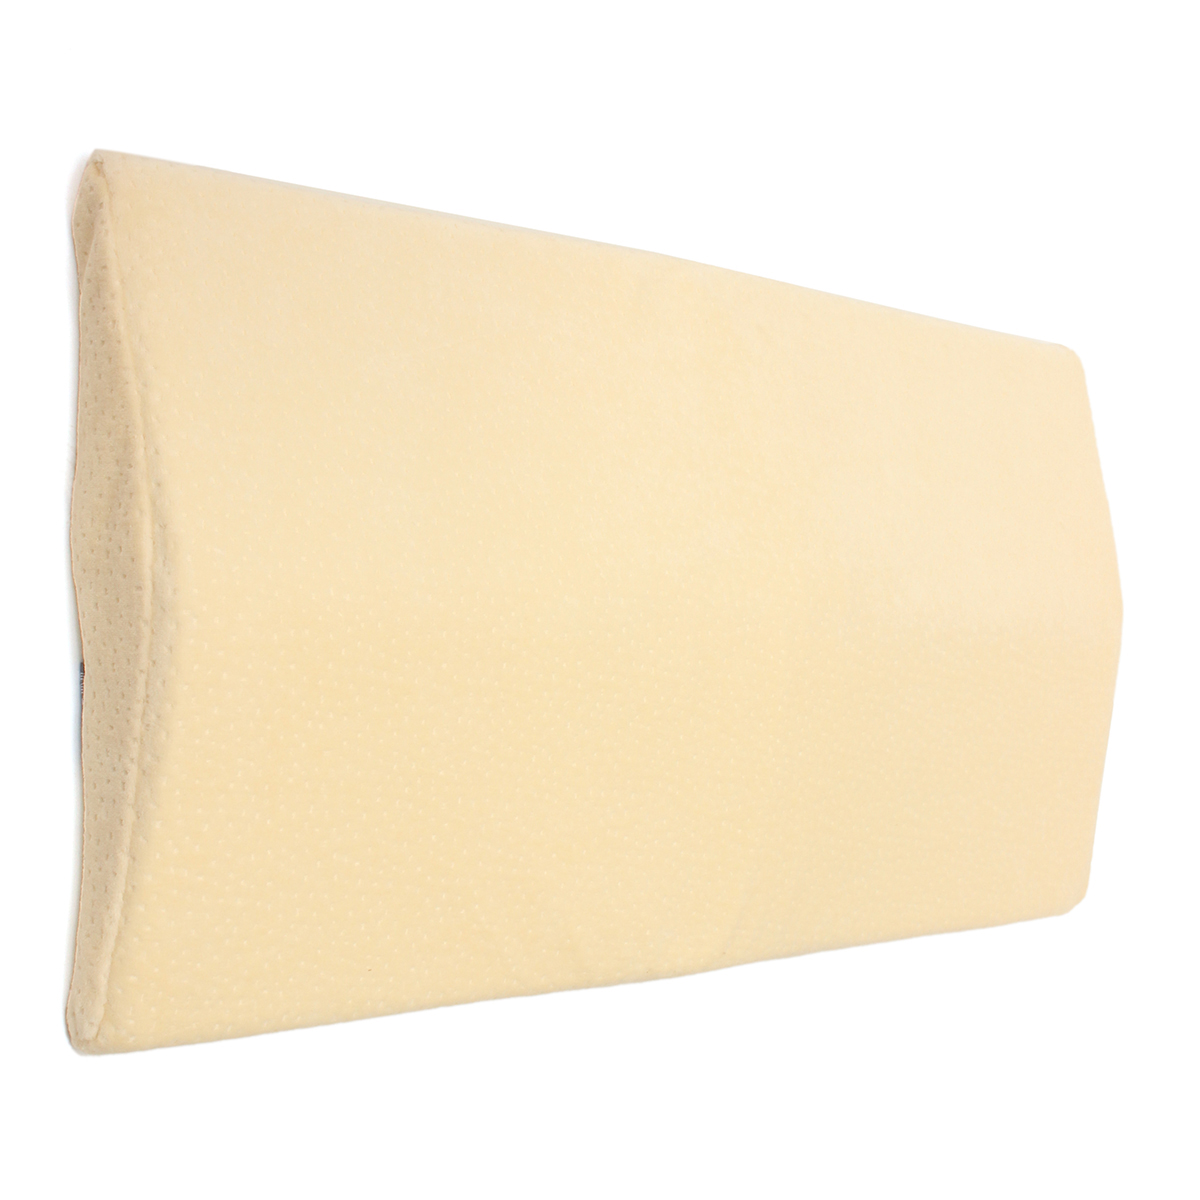 ergonomic lumbar pillow 100 pure memory foam back cushion lumbar support for lower back pain